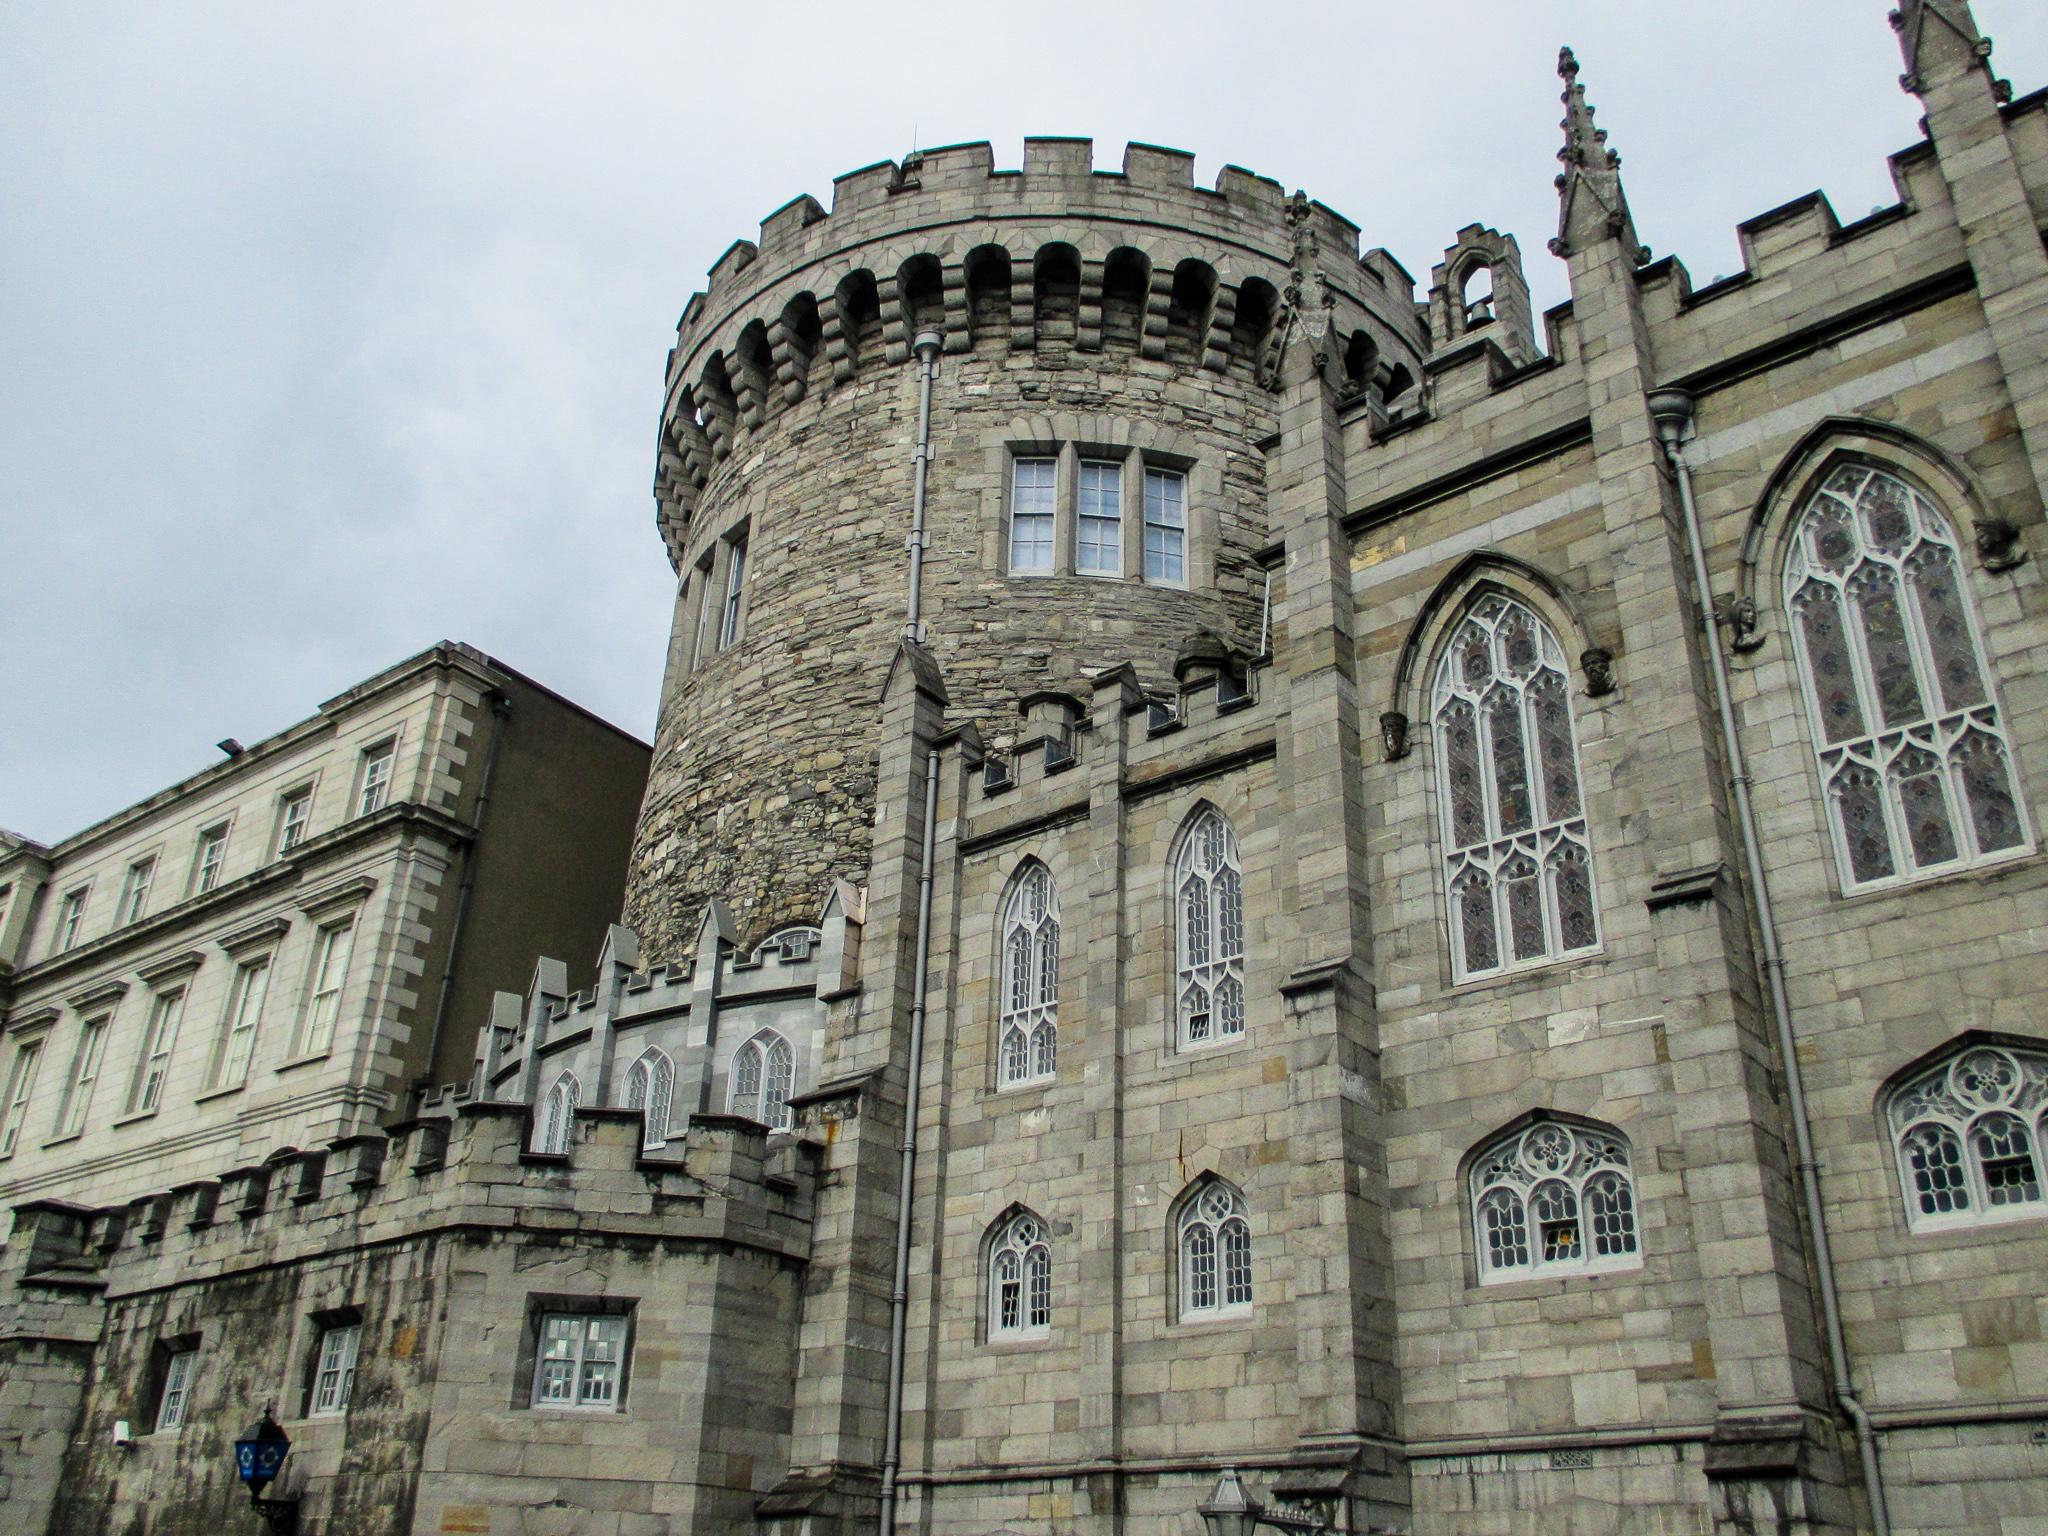 dublin castle is what to do in dublin alone